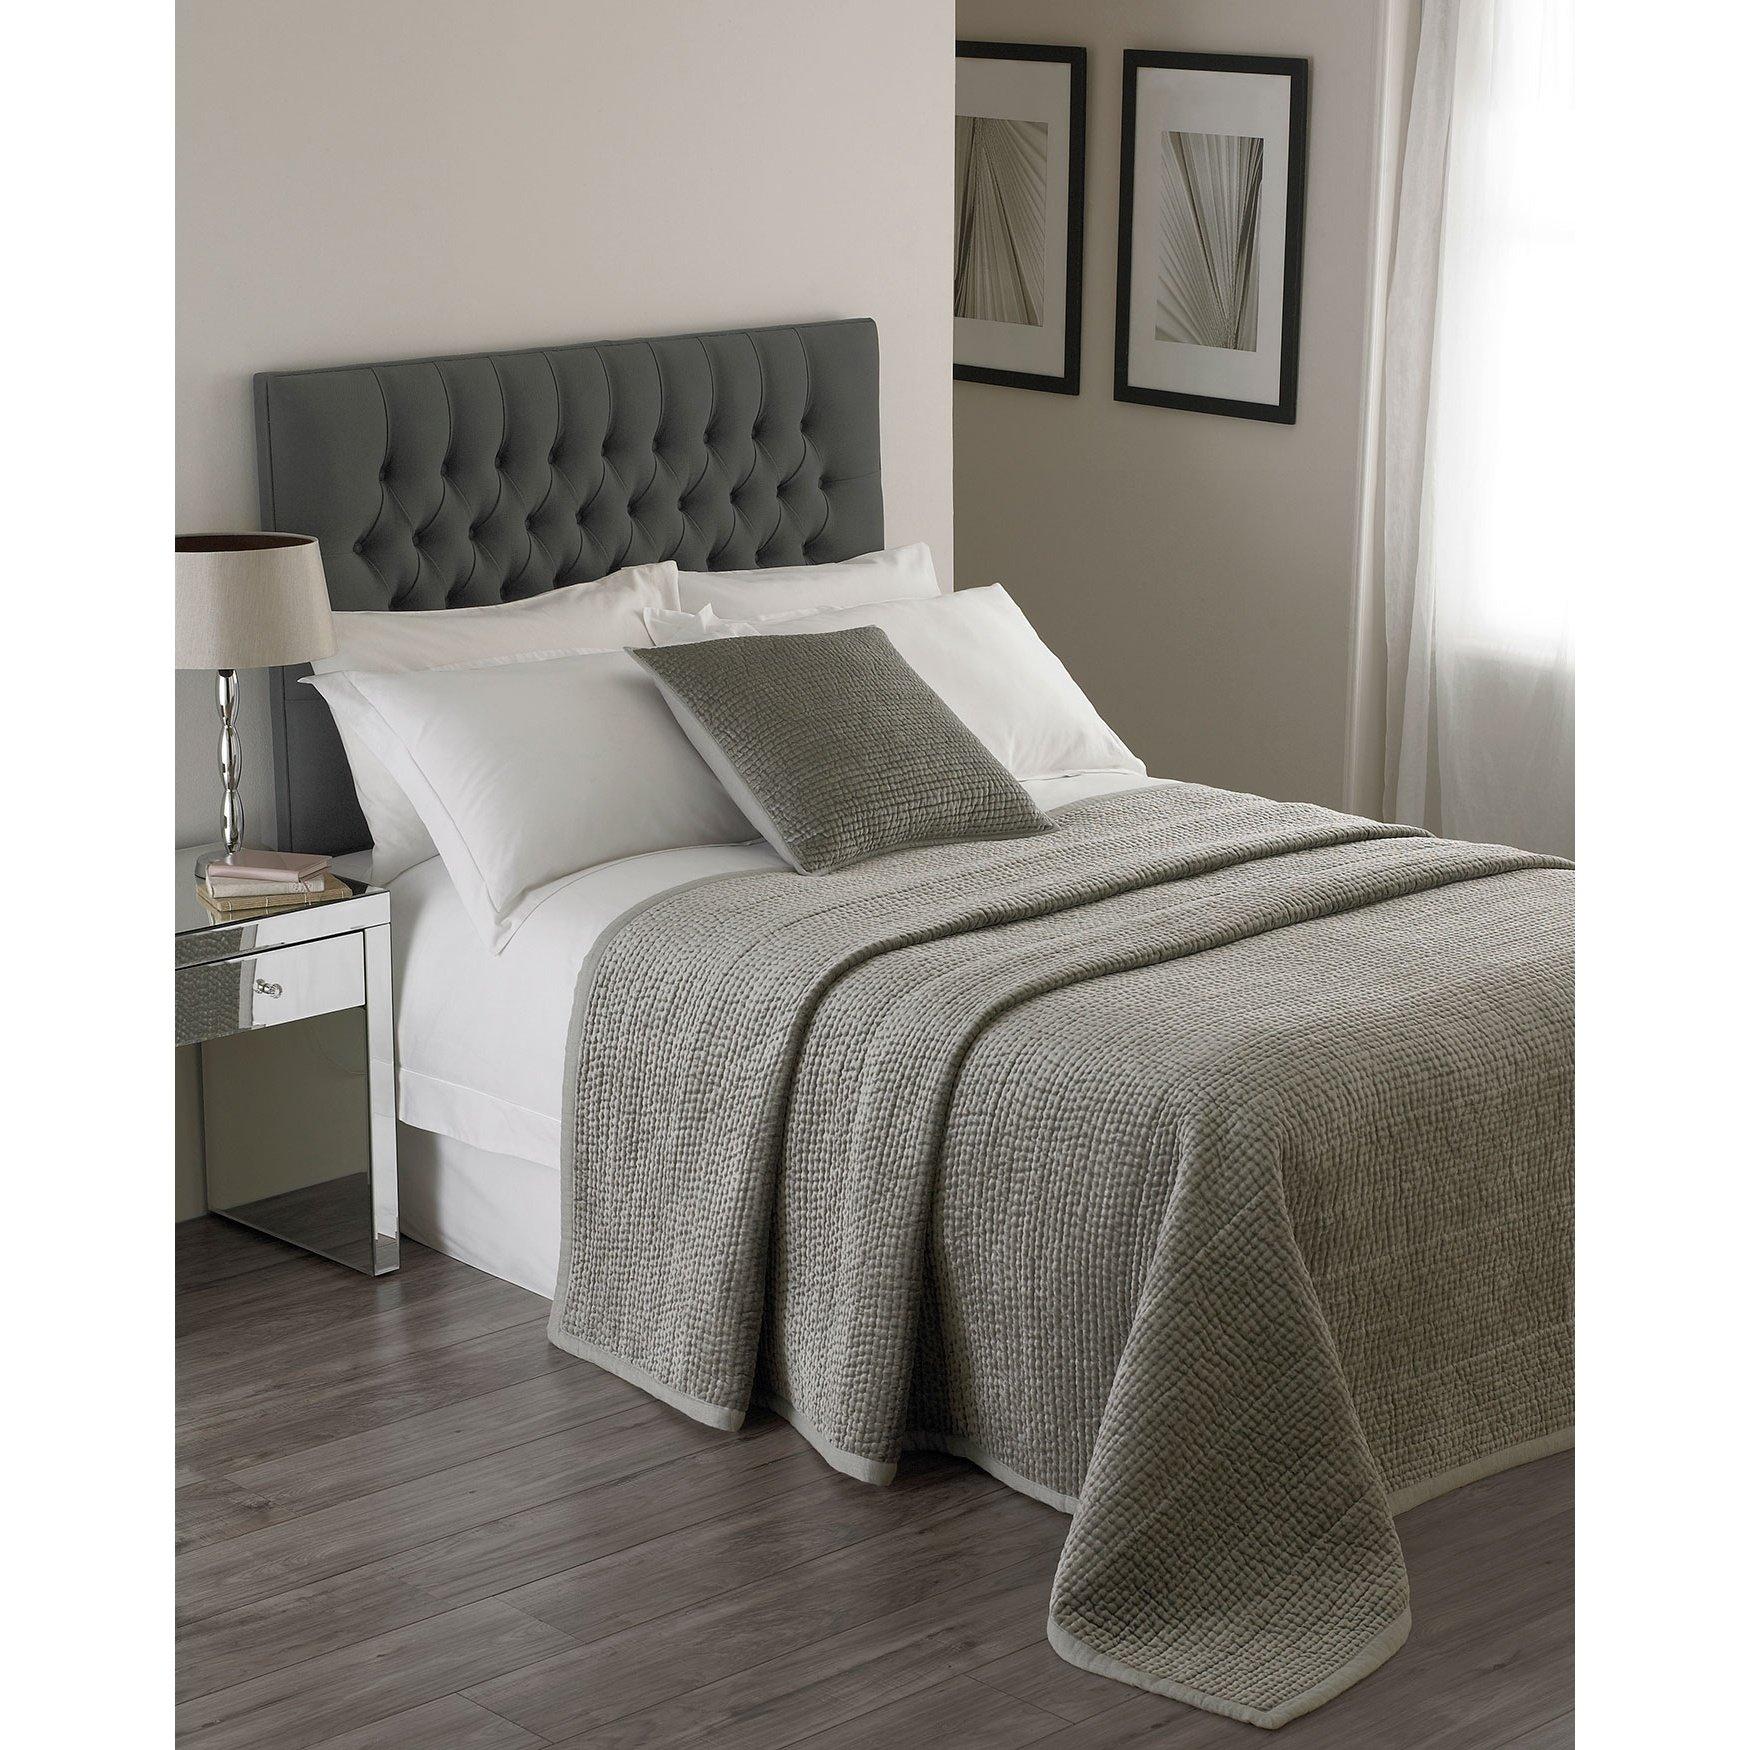 Riva Home Brooklands Bedspread (104 x 104 inch) (Silver)